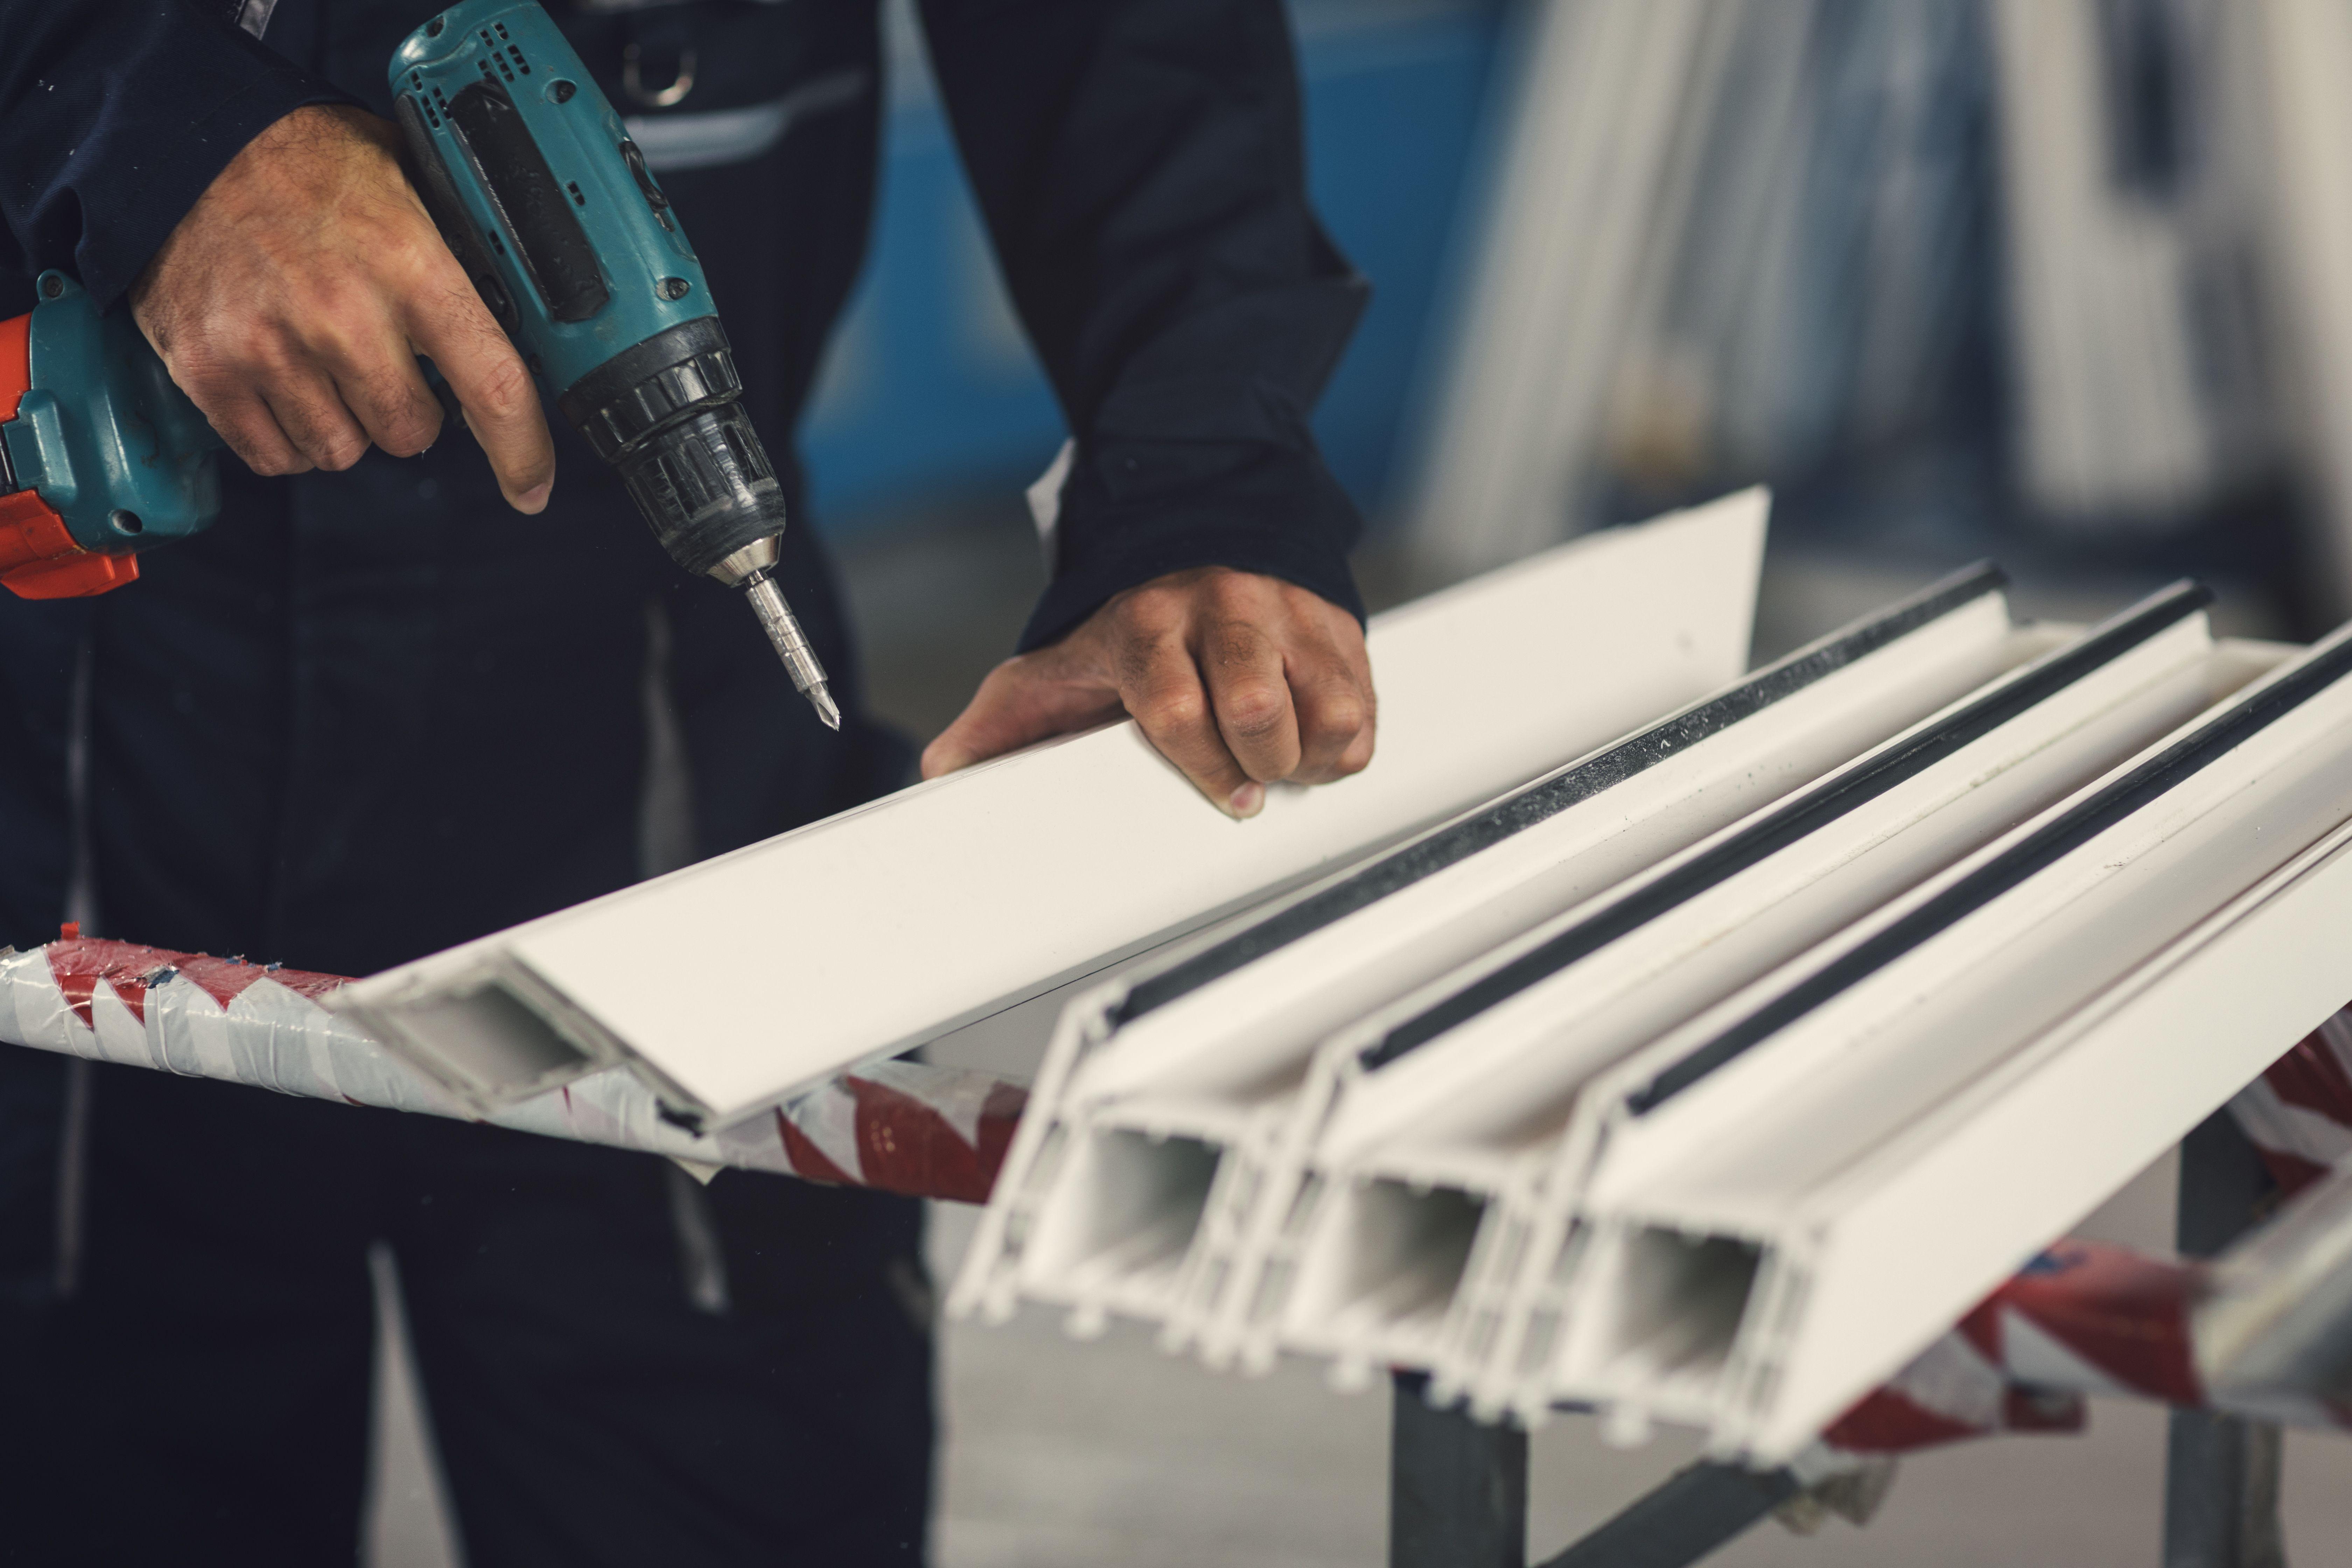 Venta de herramientas para aluminio: Catálogo de Comercial Cambel